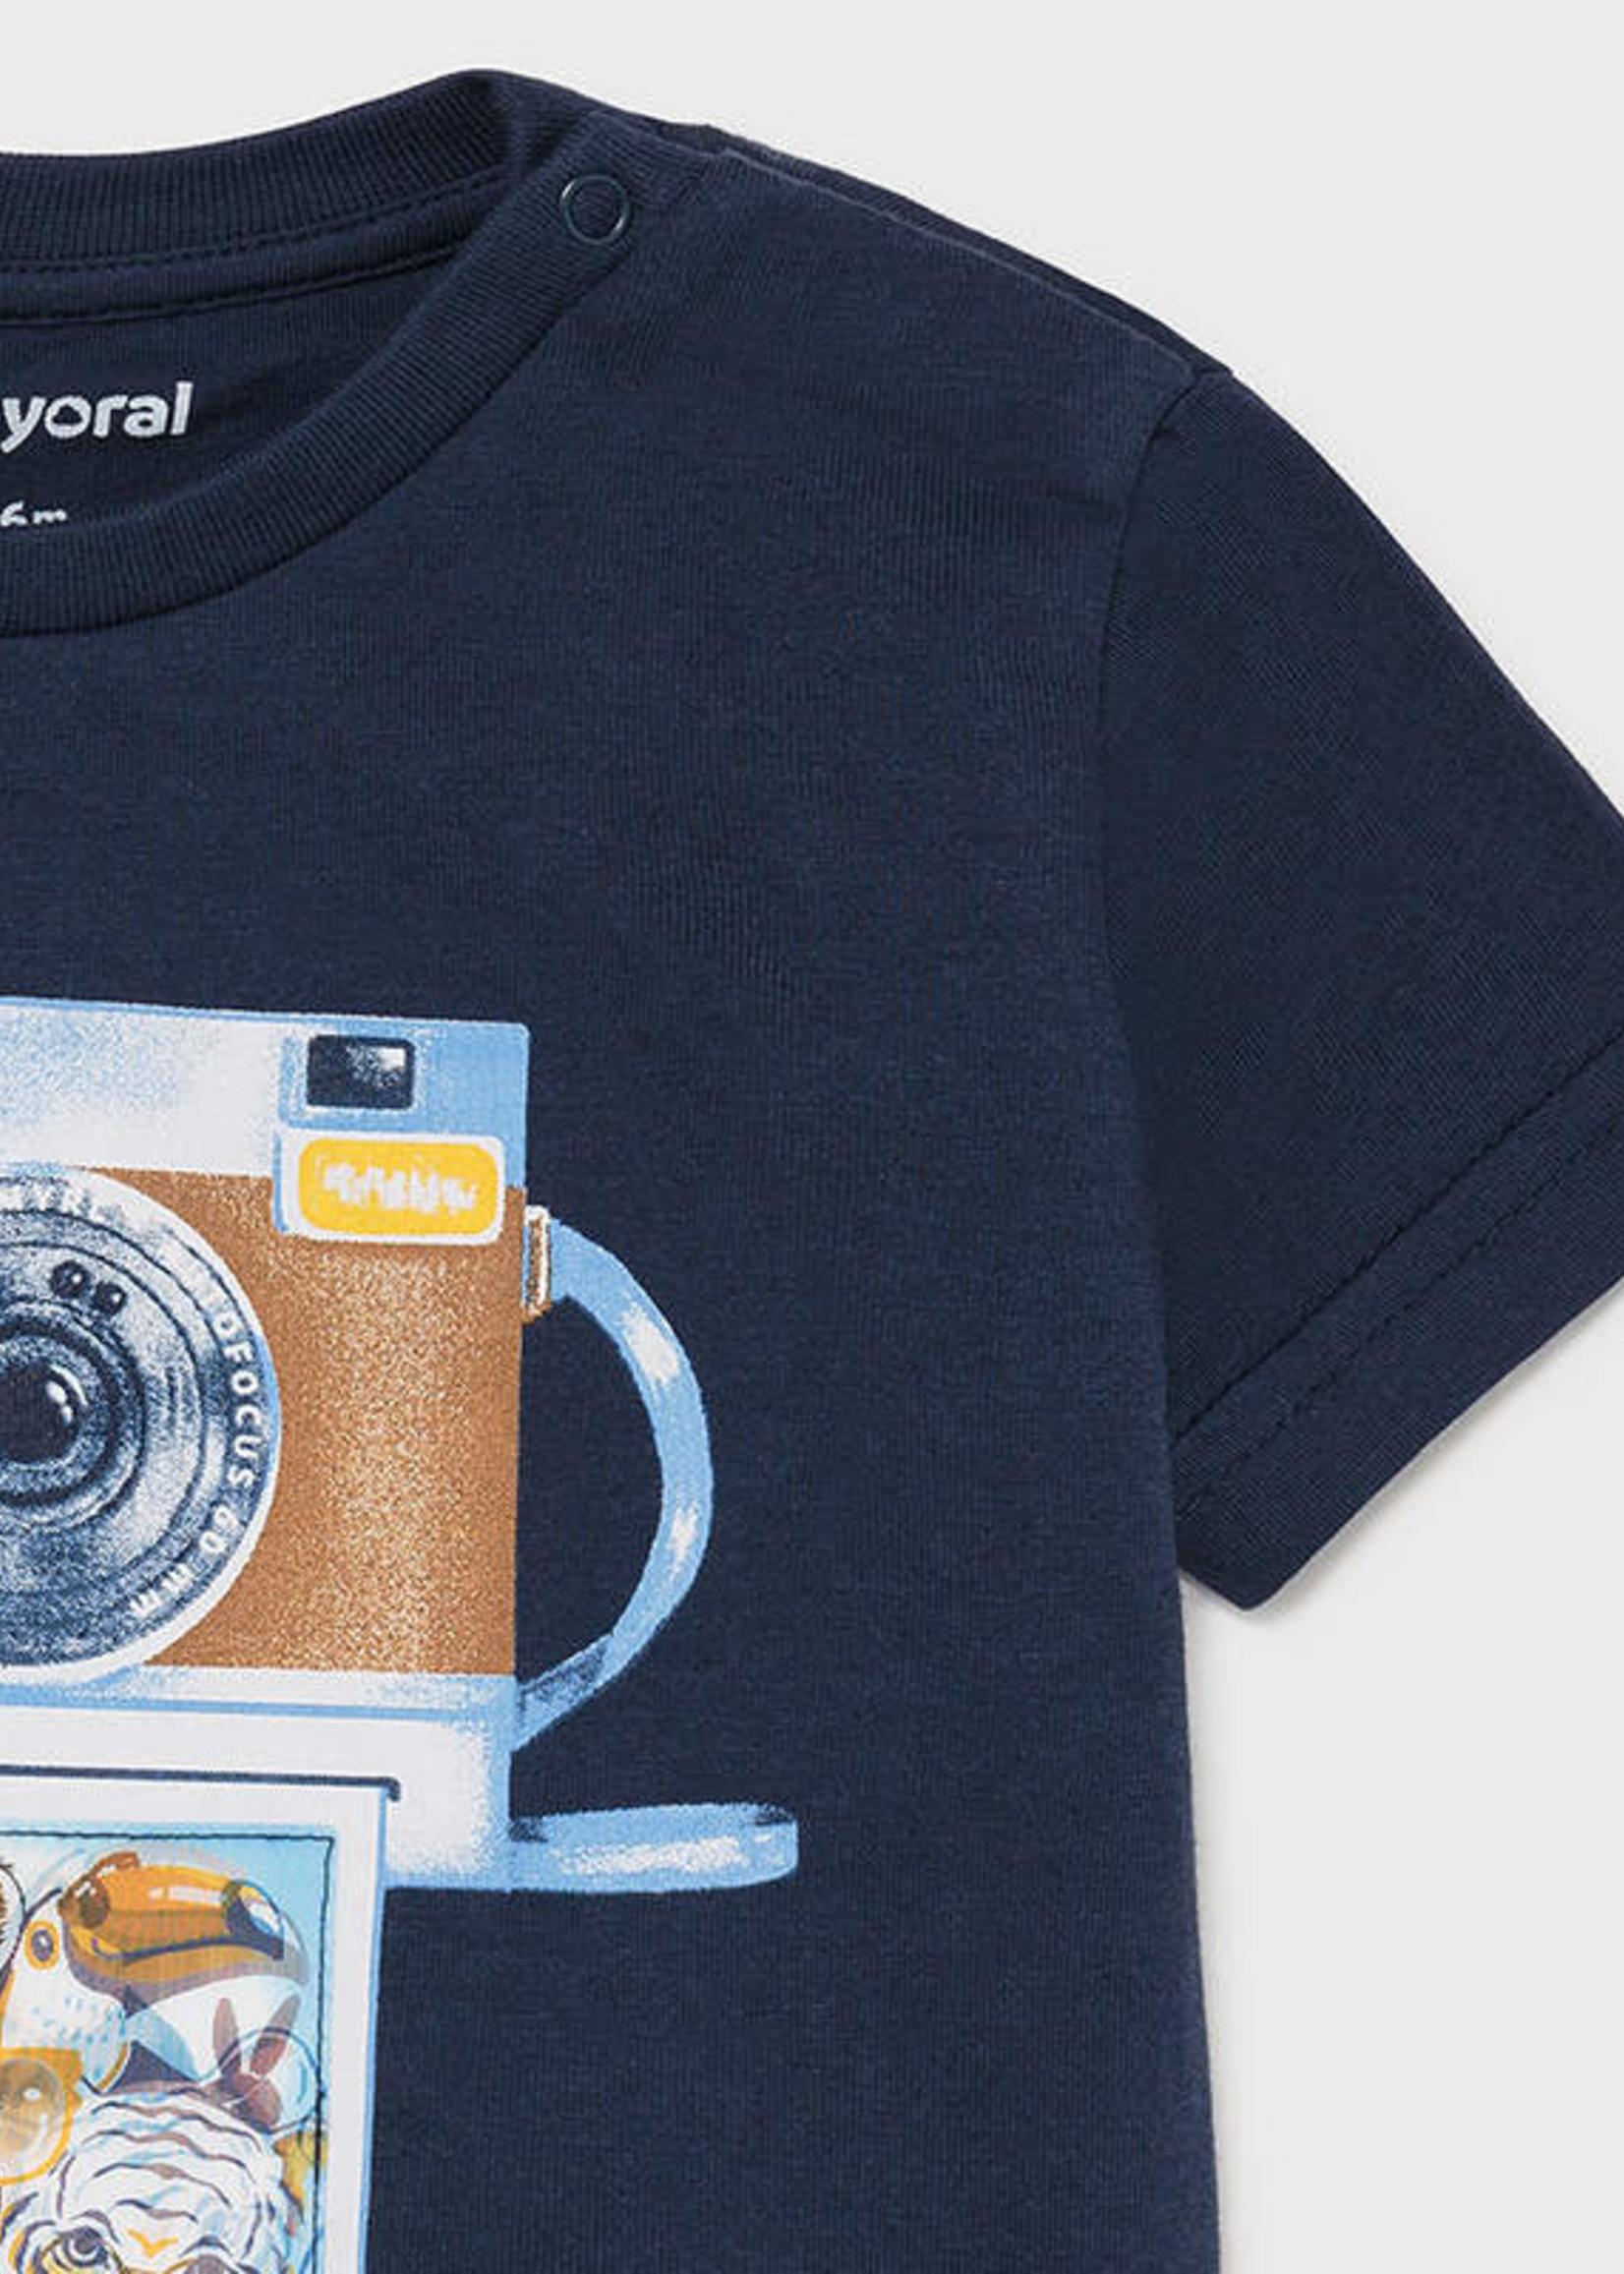 Mayoral Mayoral shirt with lens print